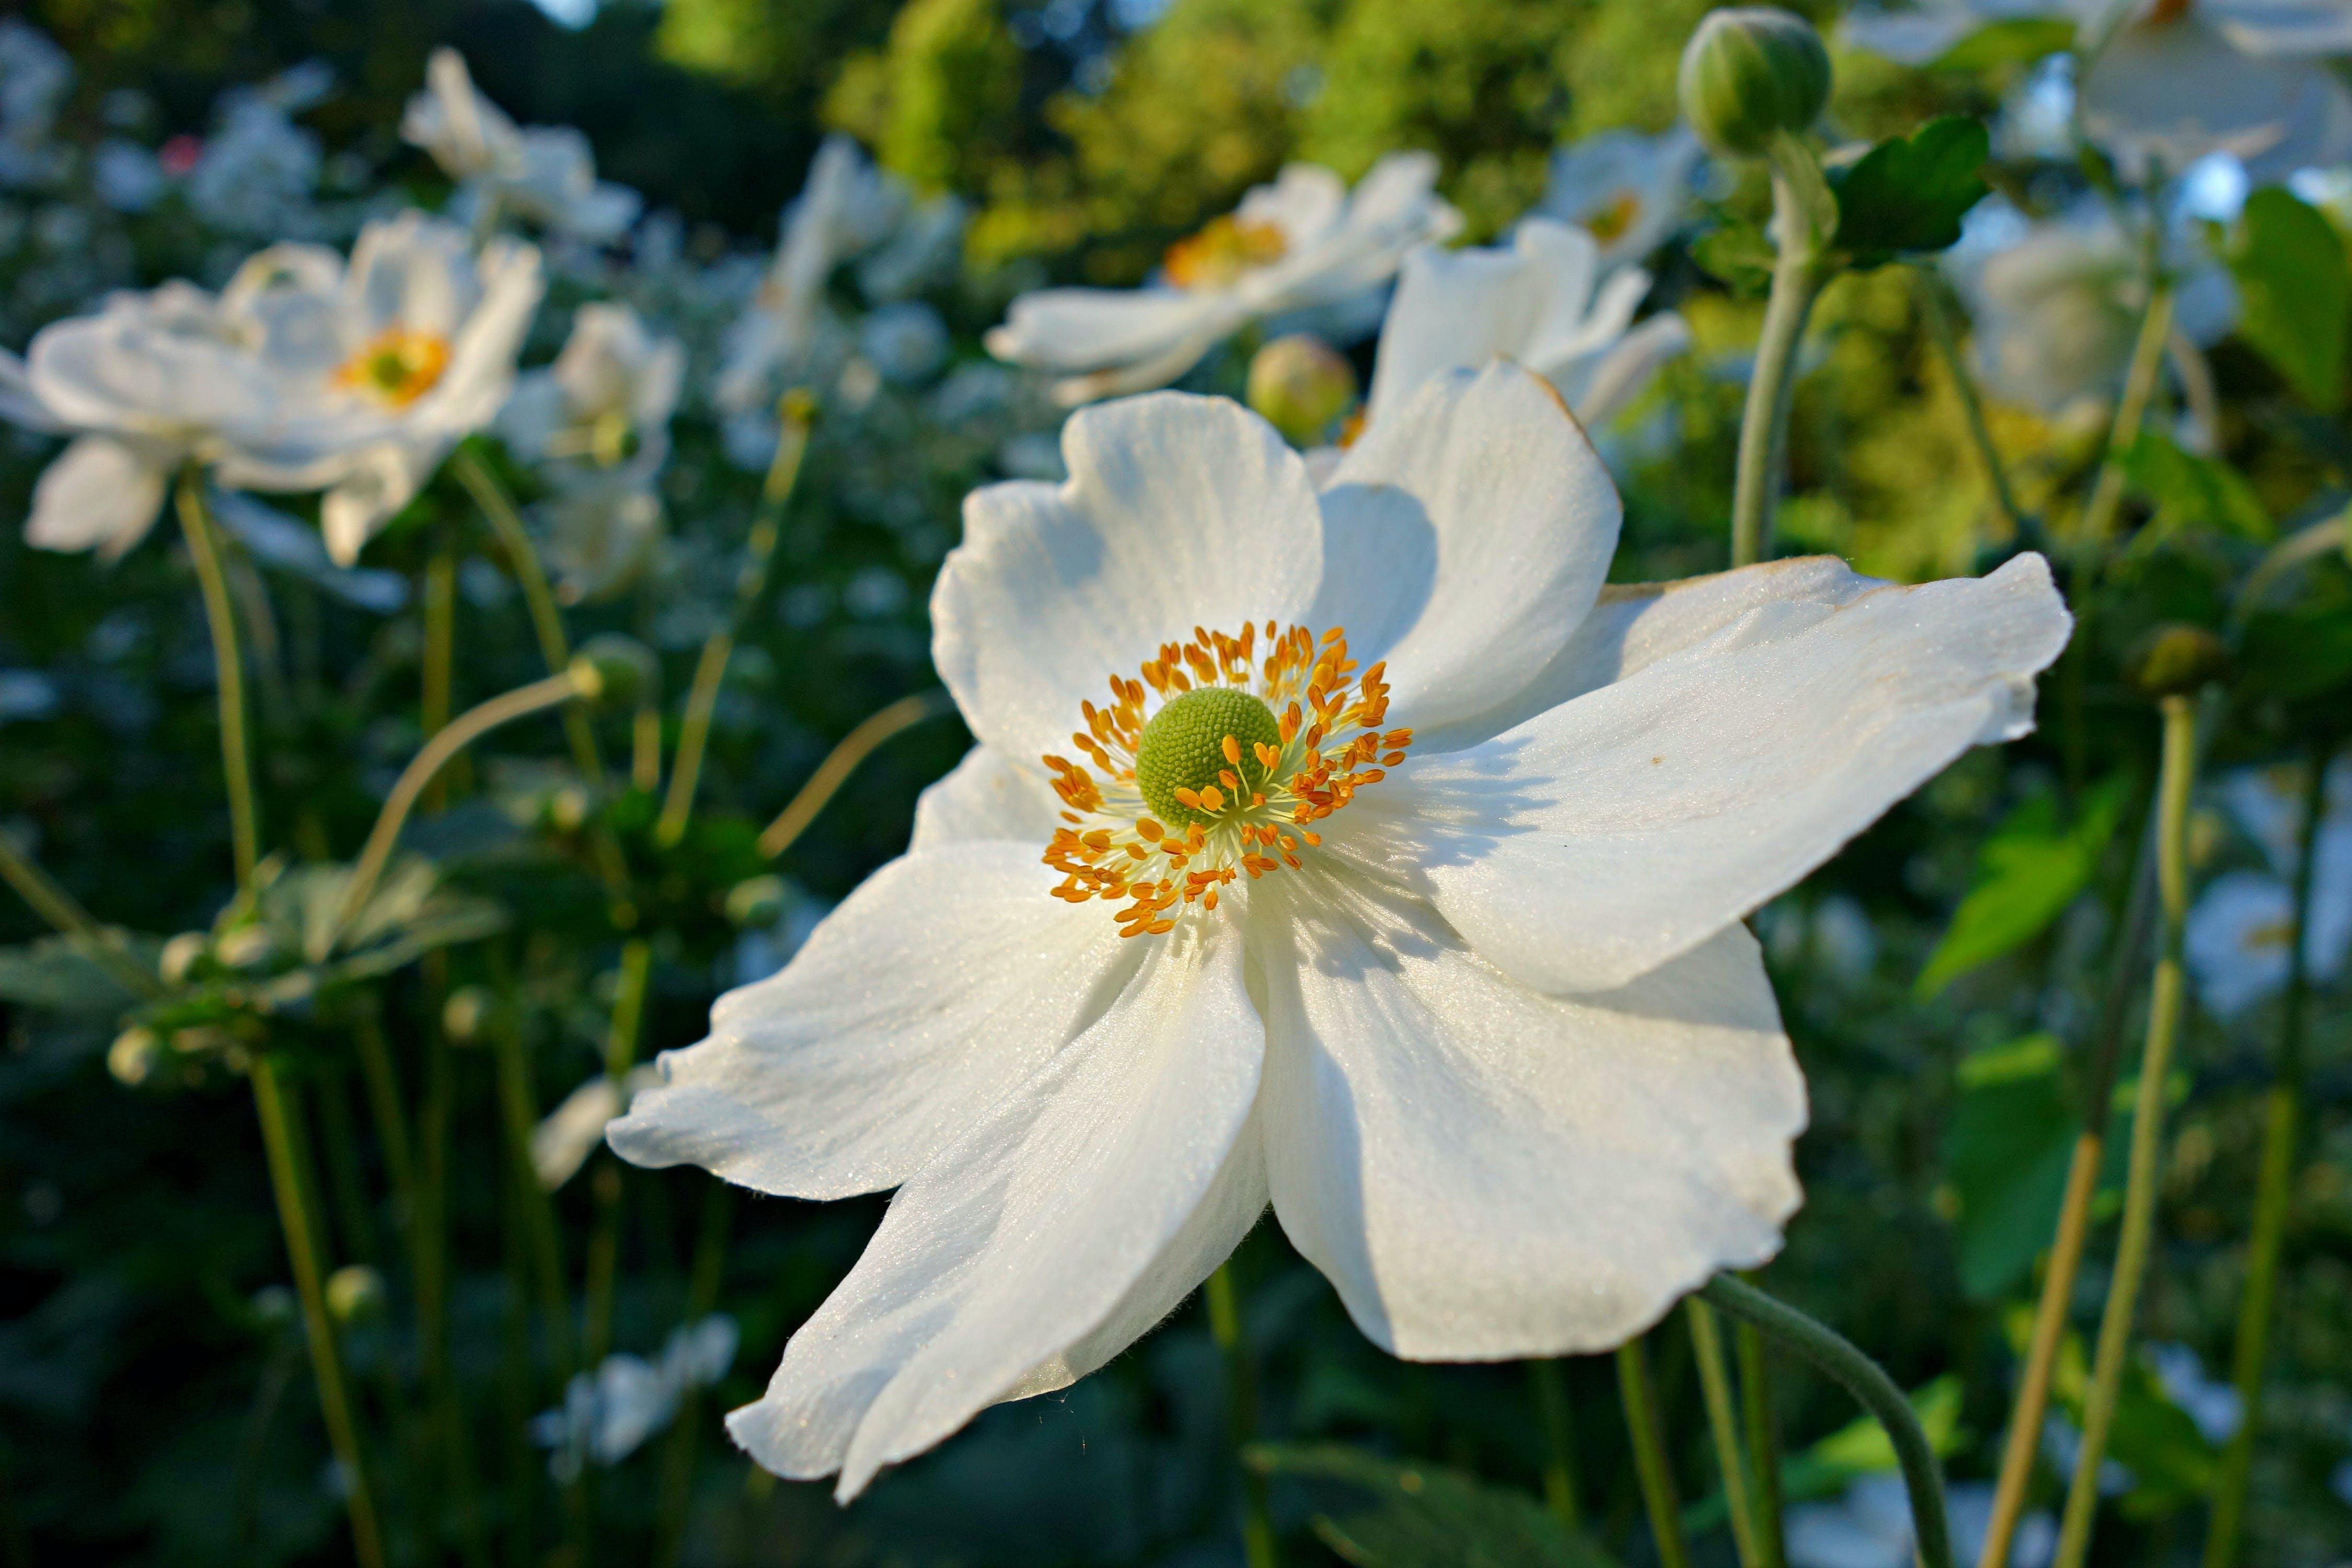 of flower, garden, petal, pollen